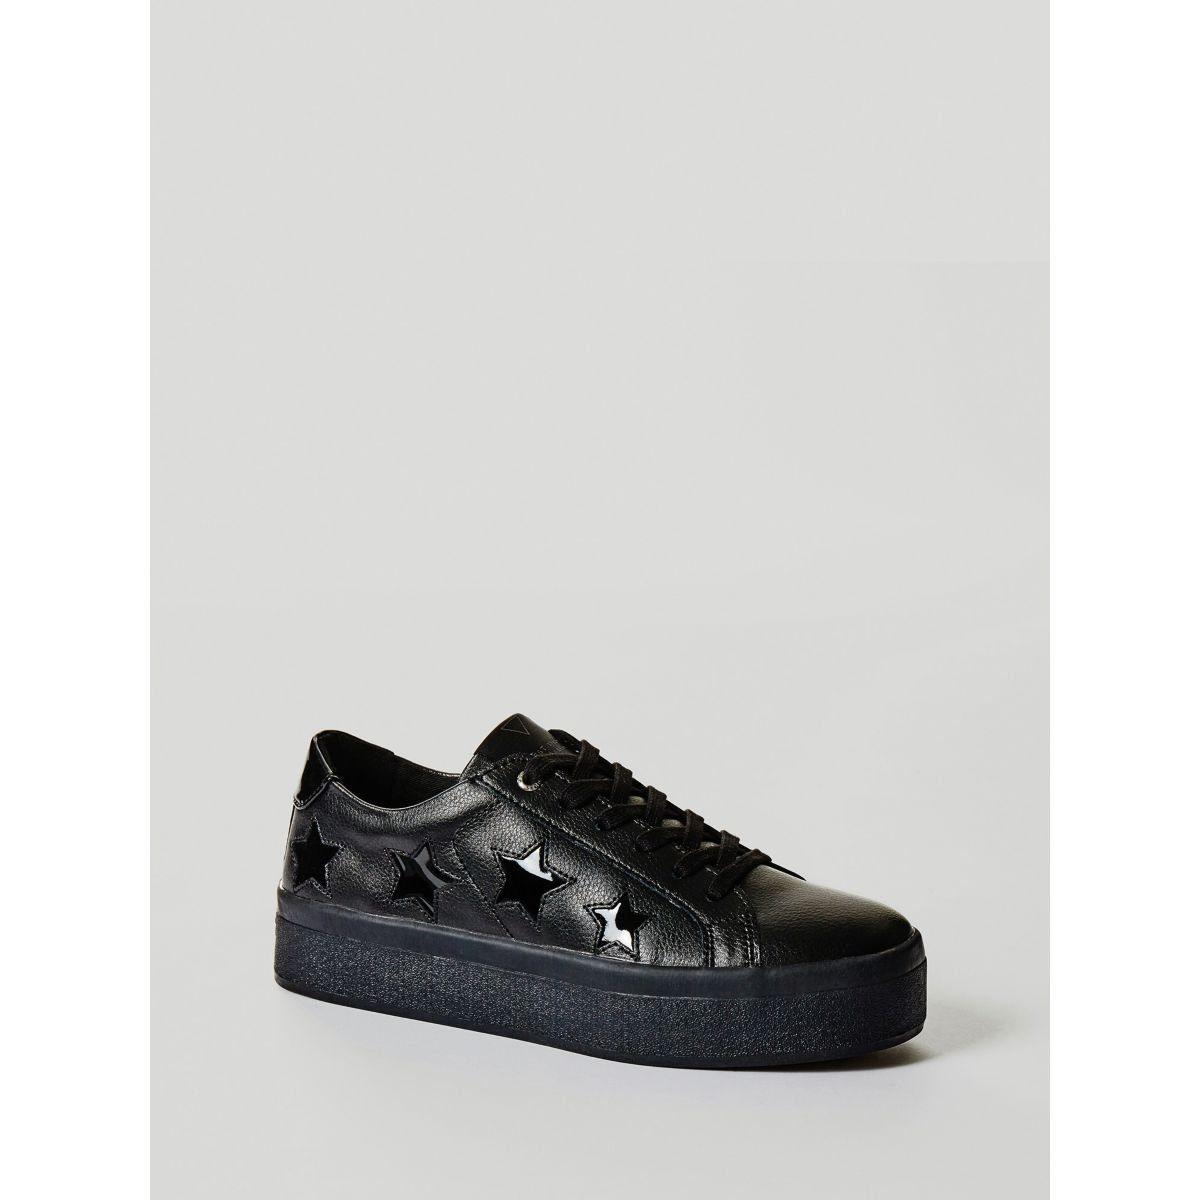 Guess Sneaker online kaufen  schwarz